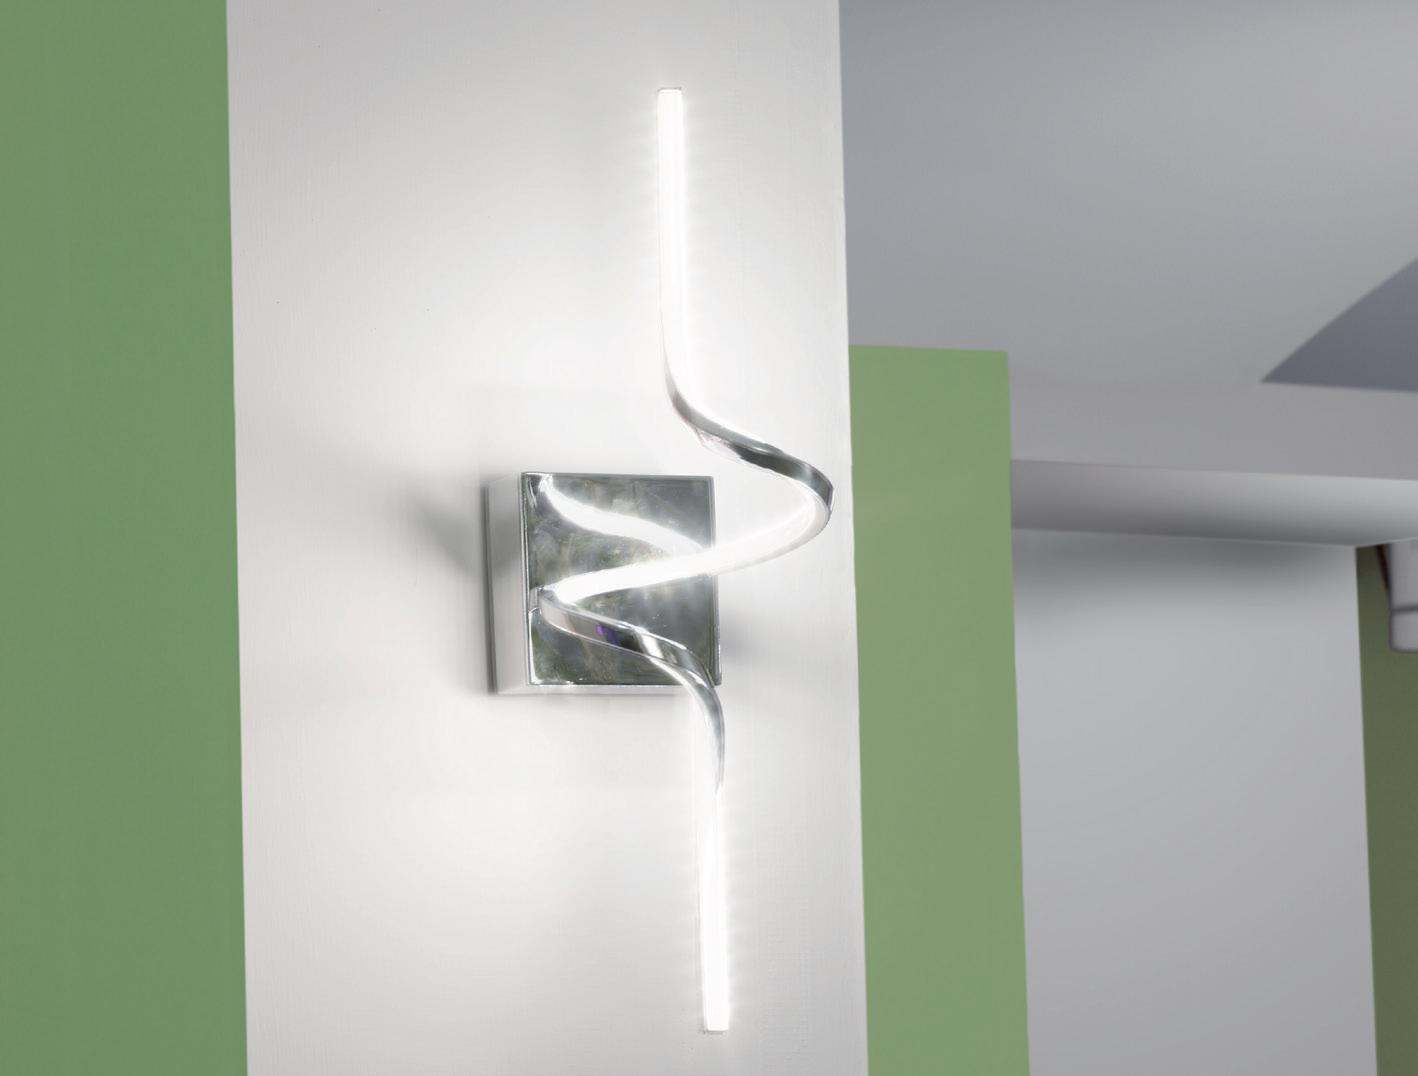 Notali Lampadari   Vendita lampadari online e Soluzioni di illuminazione -> Vendita Lampadari Led On Line